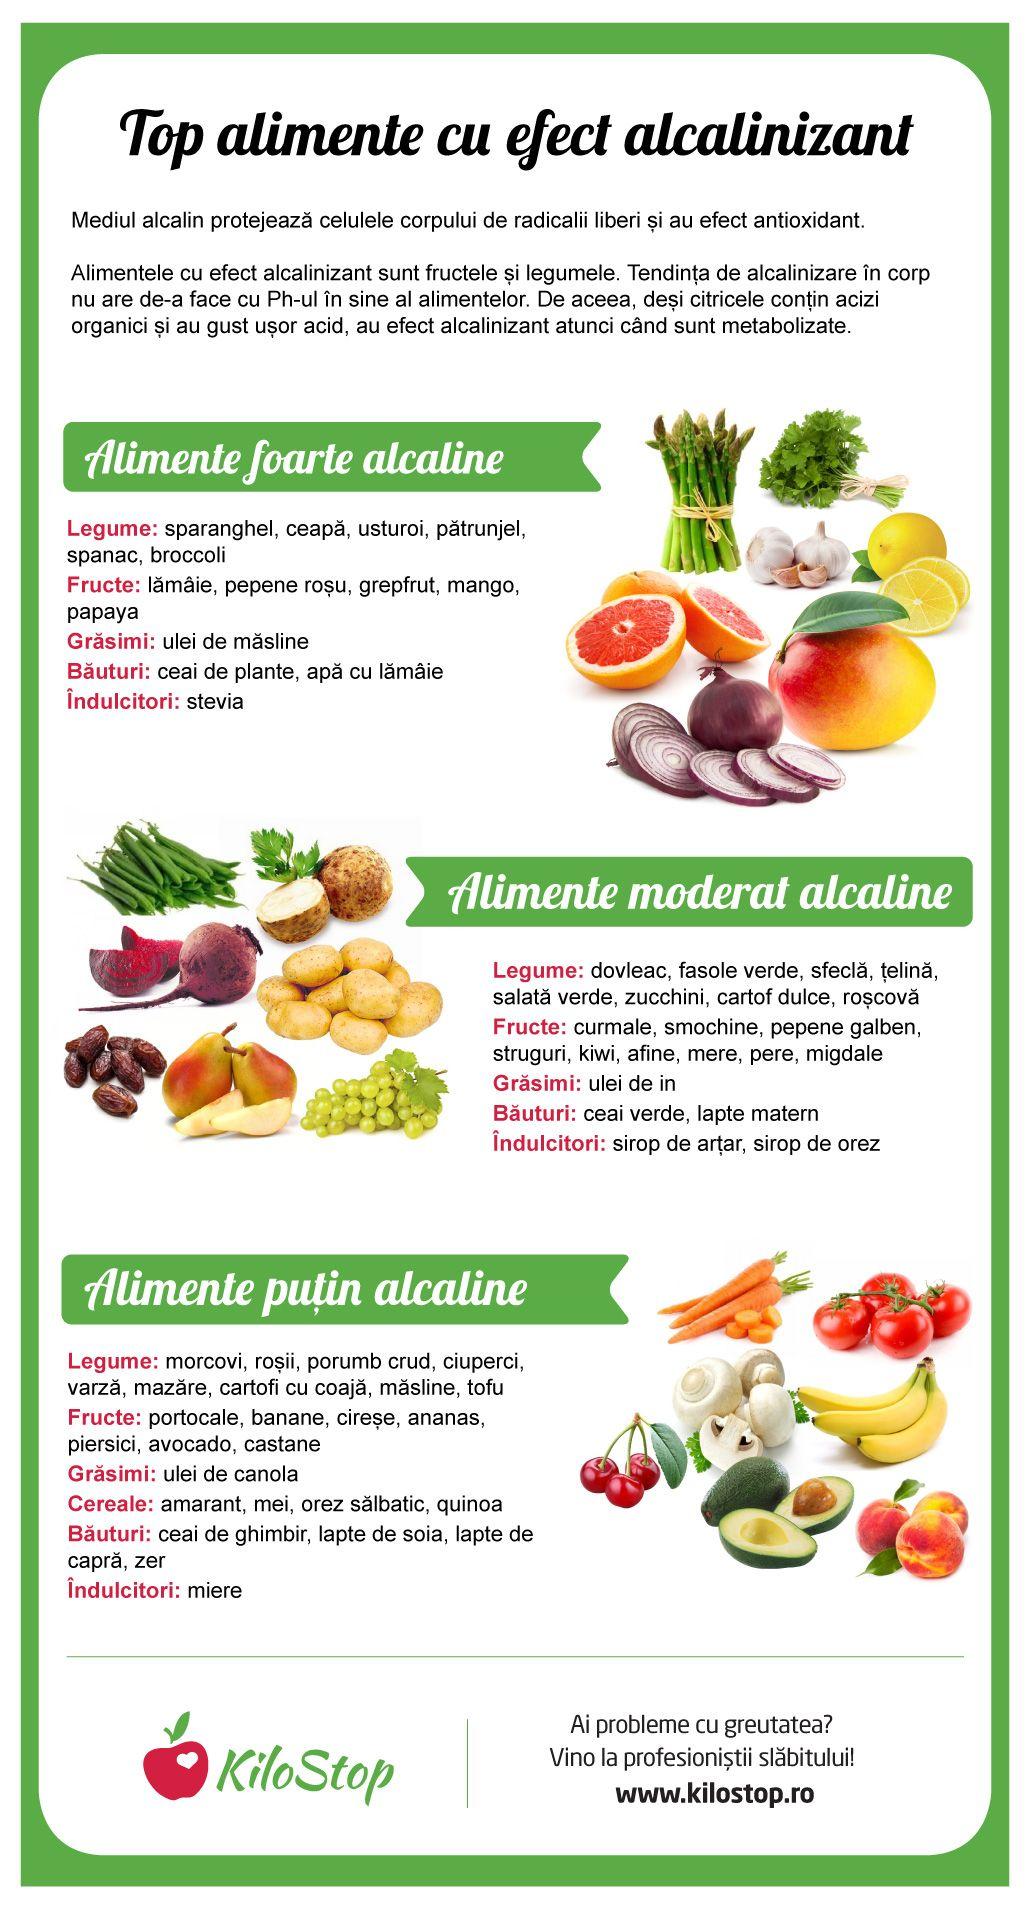 bidmc pierdere în greutate webinar slimming ready mese aldi